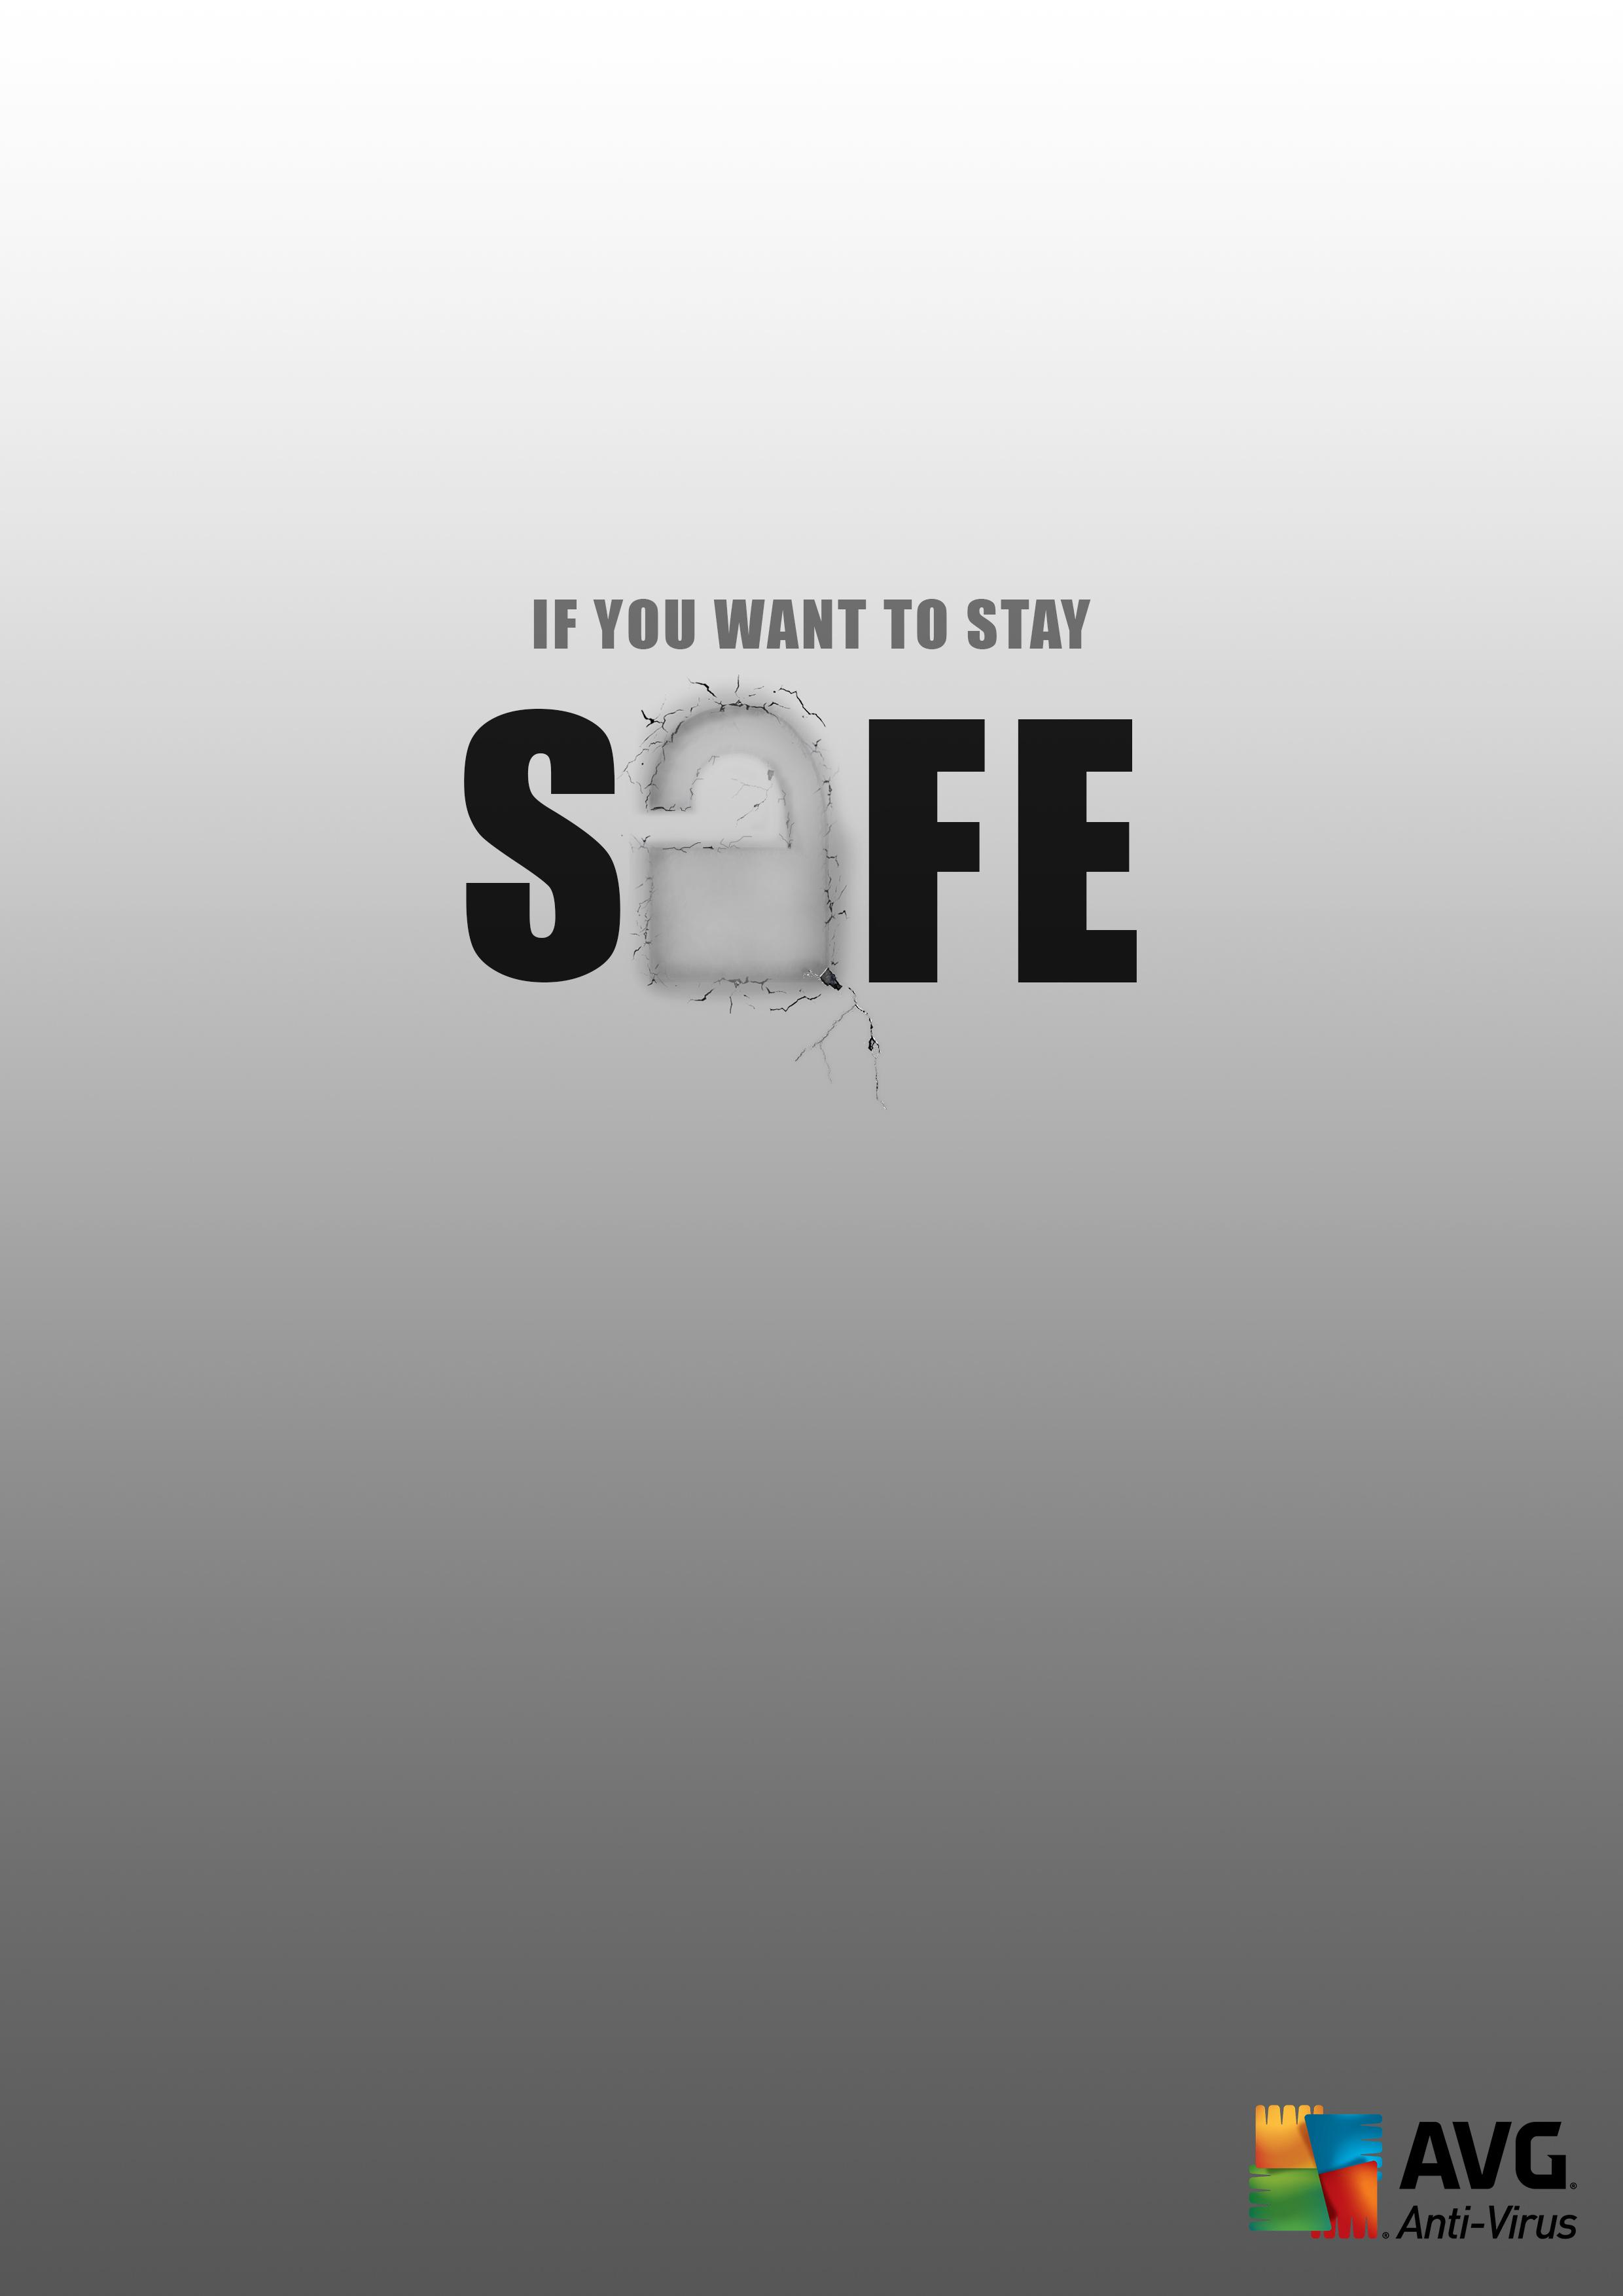 AVG Print Ad - Safe